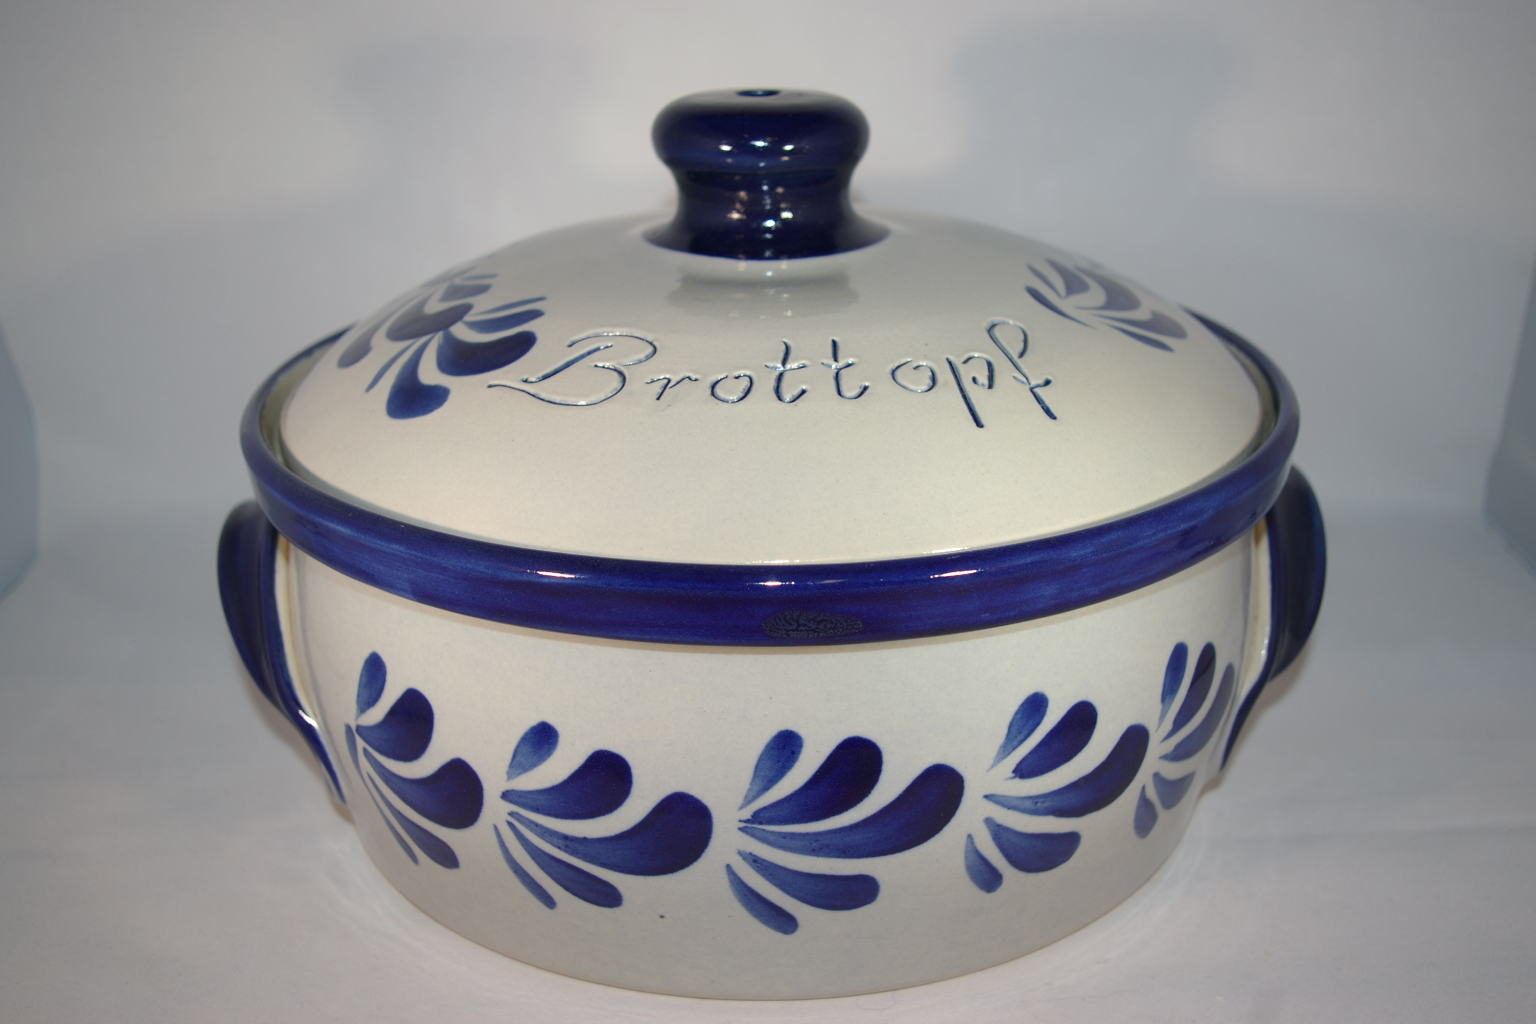 brottopf rund grau blau keramik seifert ronny seifert toepferei seifert ihr namenstassen. Black Bedroom Furniture Sets. Home Design Ideas